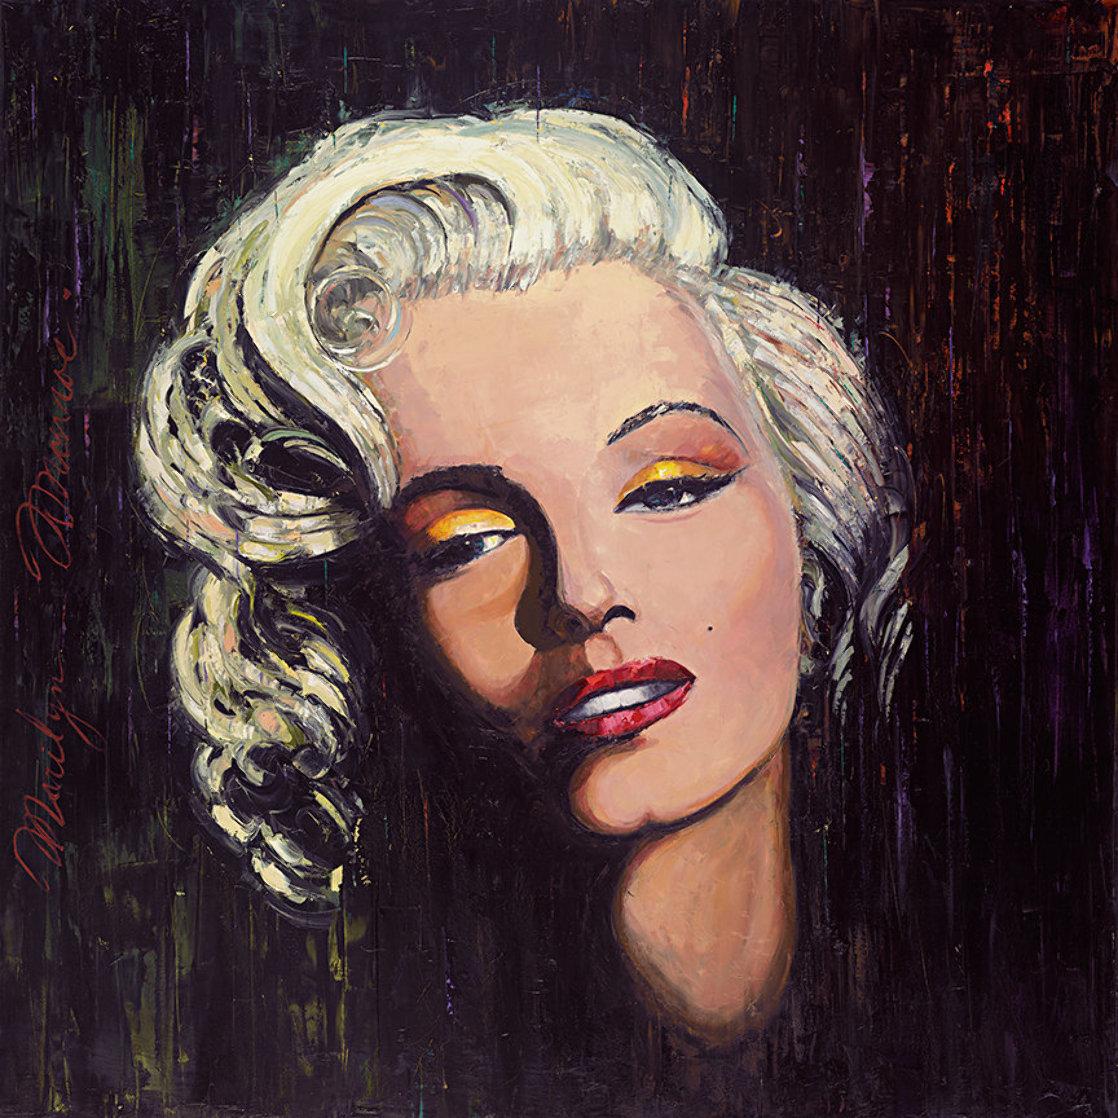 Marilyn - Golden Star 2014 48x48 Original Painting by Roman Czerwinski